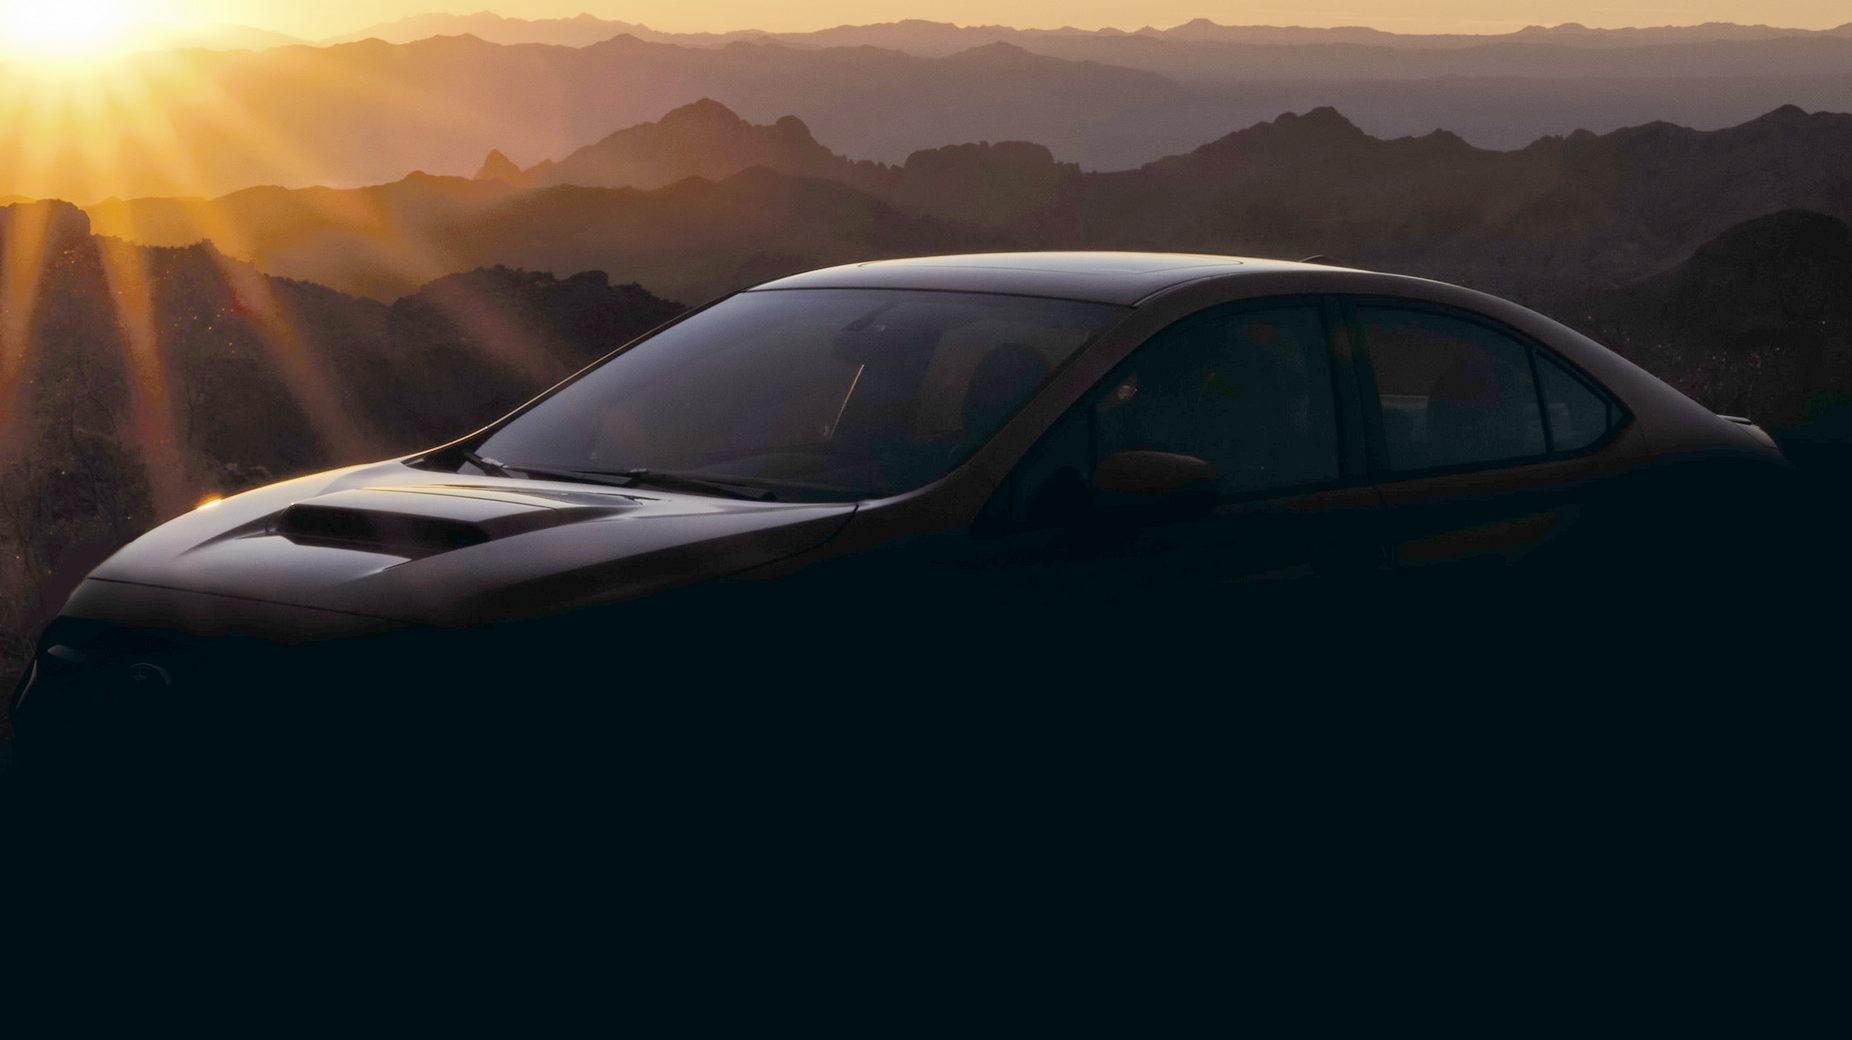 2022 Subaru WRX Will Debut on August 19